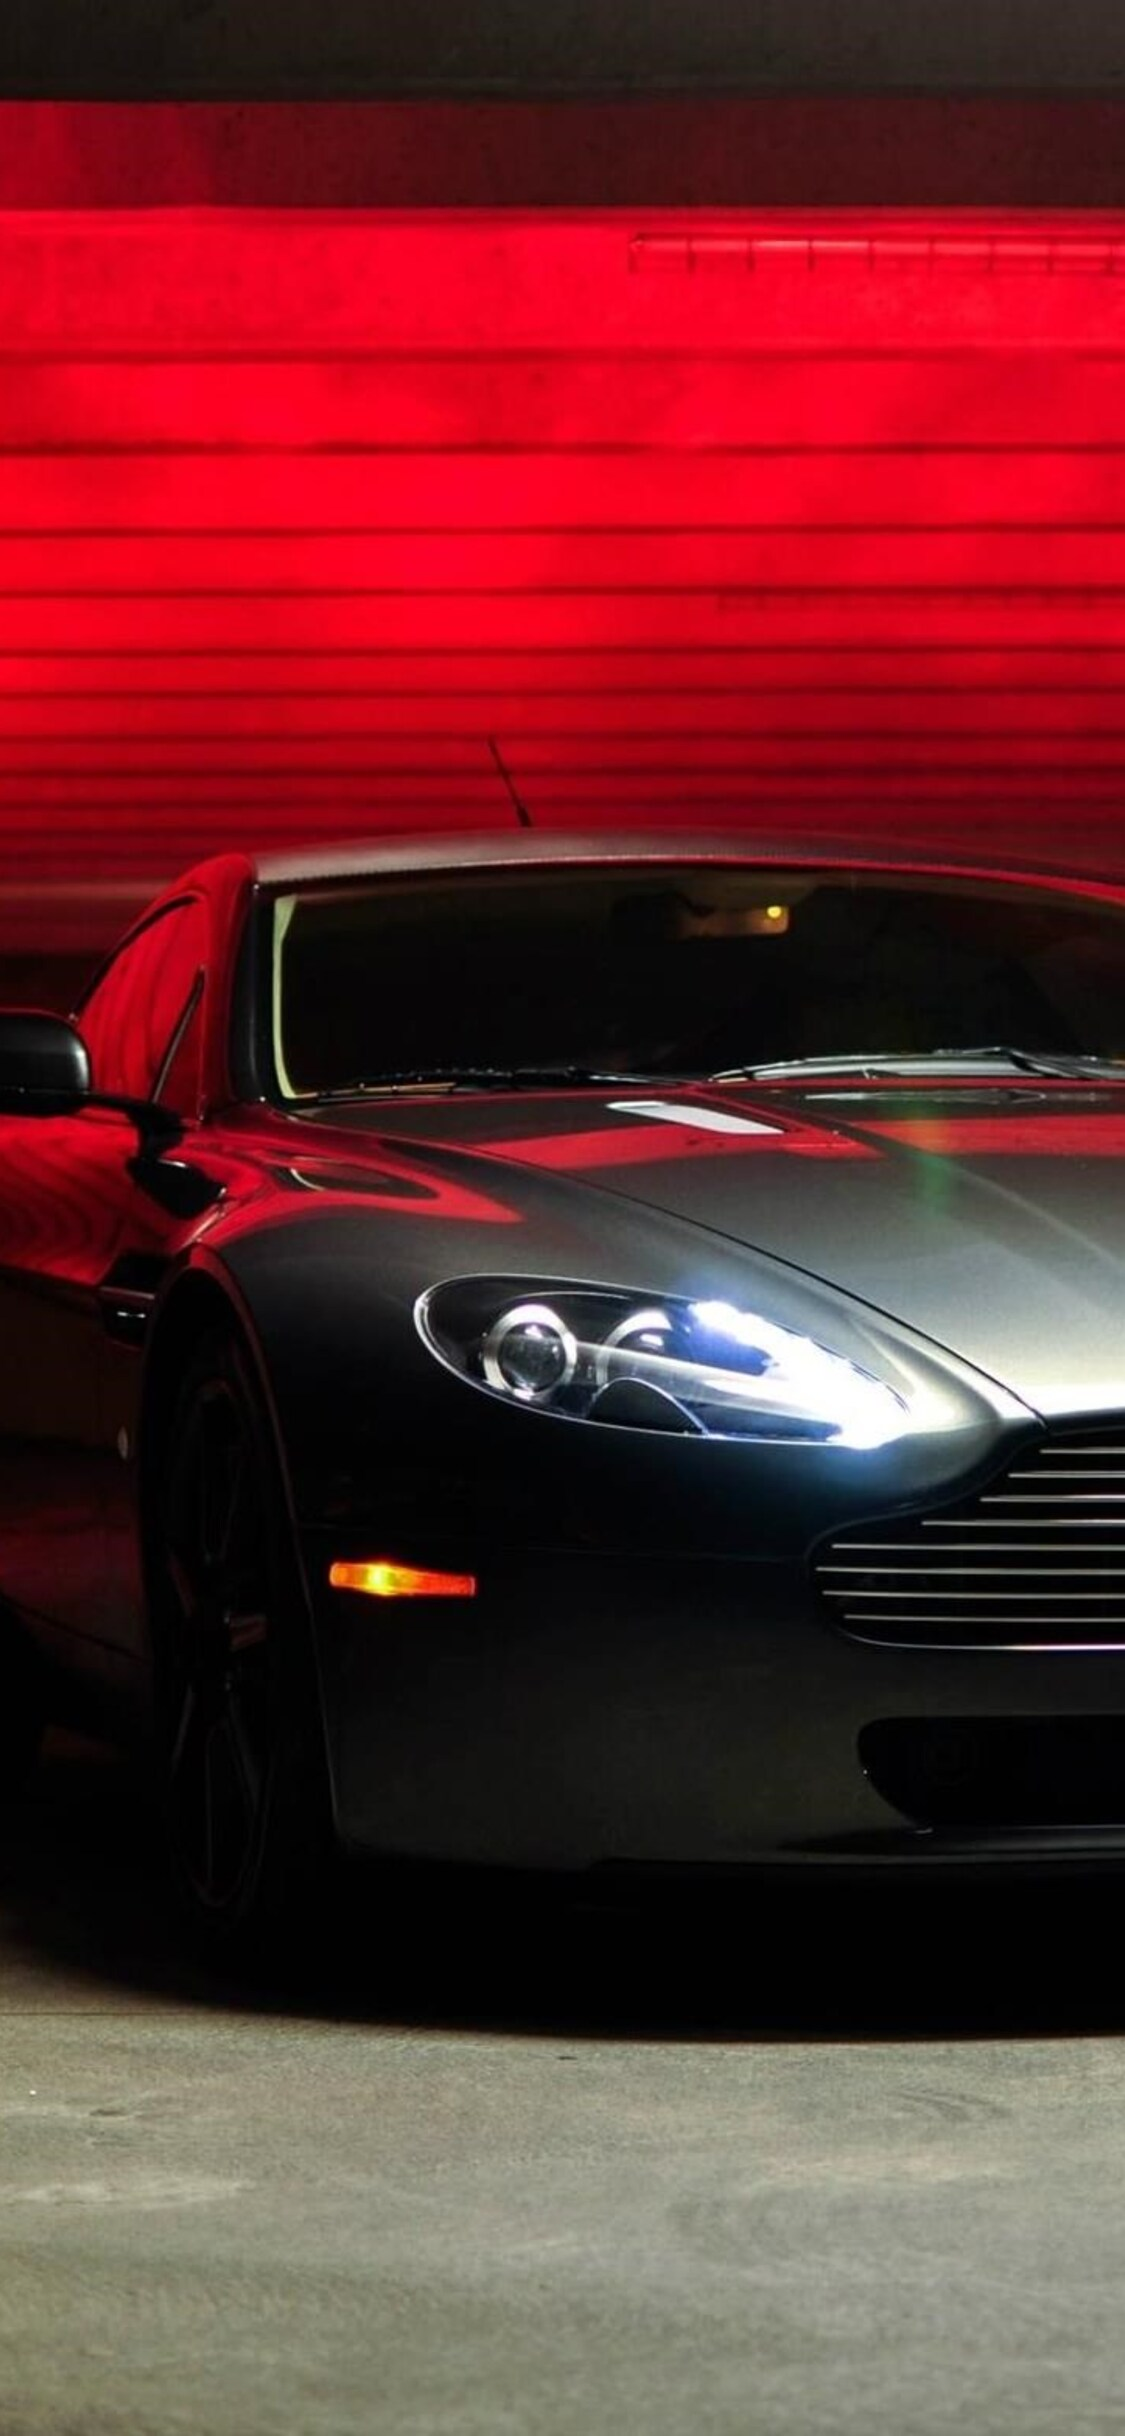 best loved e0fde 91908 1125x2436 Aston Martin Vantage Lights Iphone XS,Iphone 10,Iphone X ...